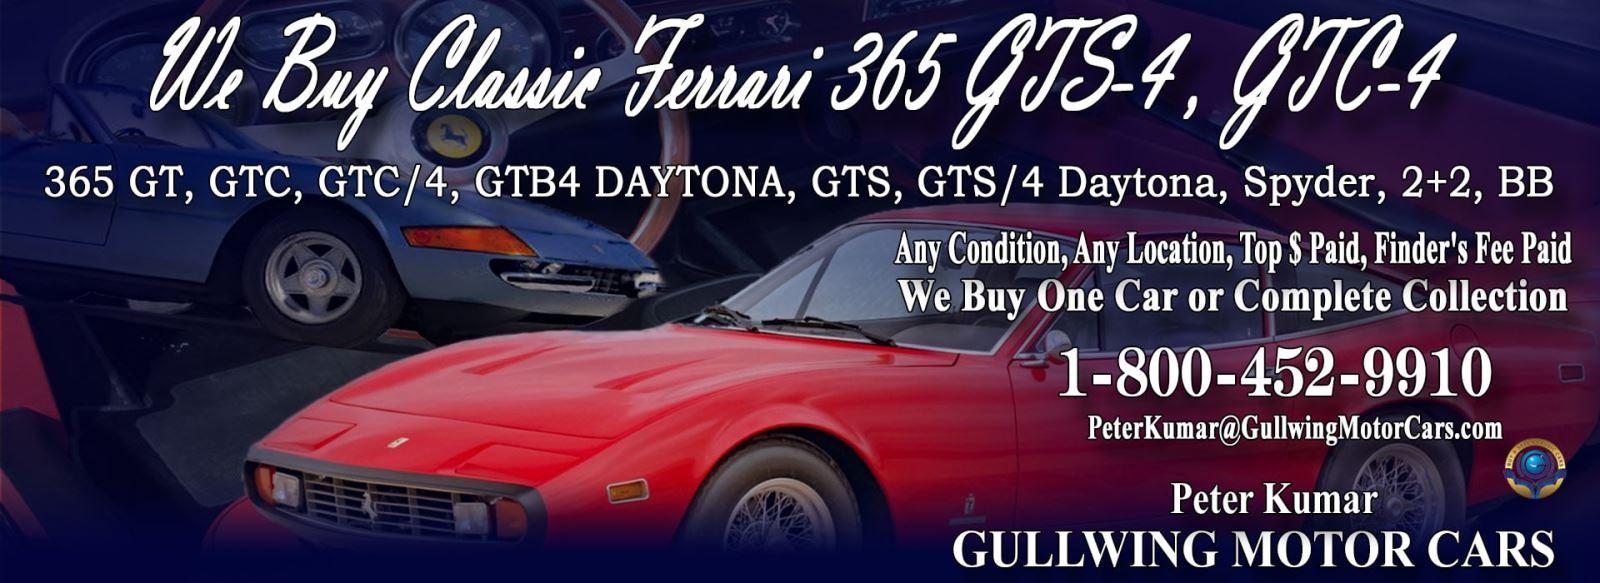 Classic Ferrari 365 GTS and 365 GTC for sale, we buy vintage Ferrari 365 GTS and 365 GTC. Call Peter Kumar. Gullwing Motor